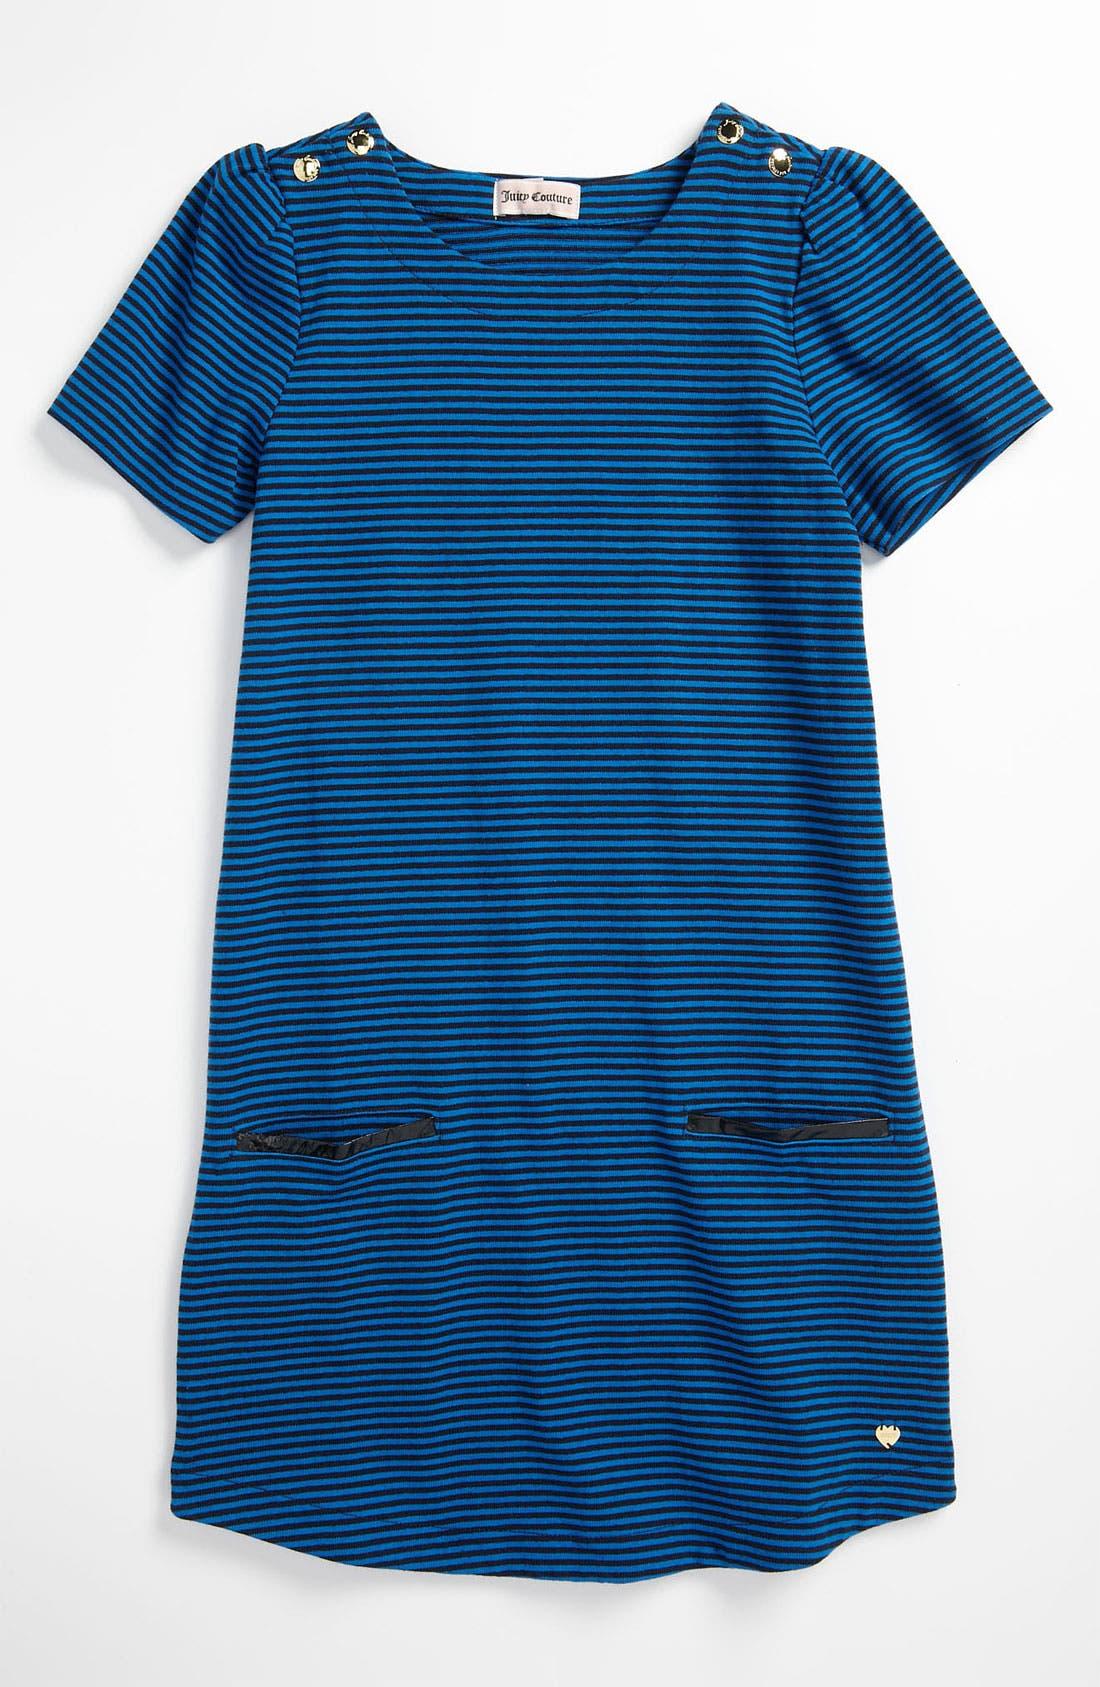 Alternate Image 1 Selected - Juicy Couture Stripe Jersey Dress (Little Girls & Big Girls)